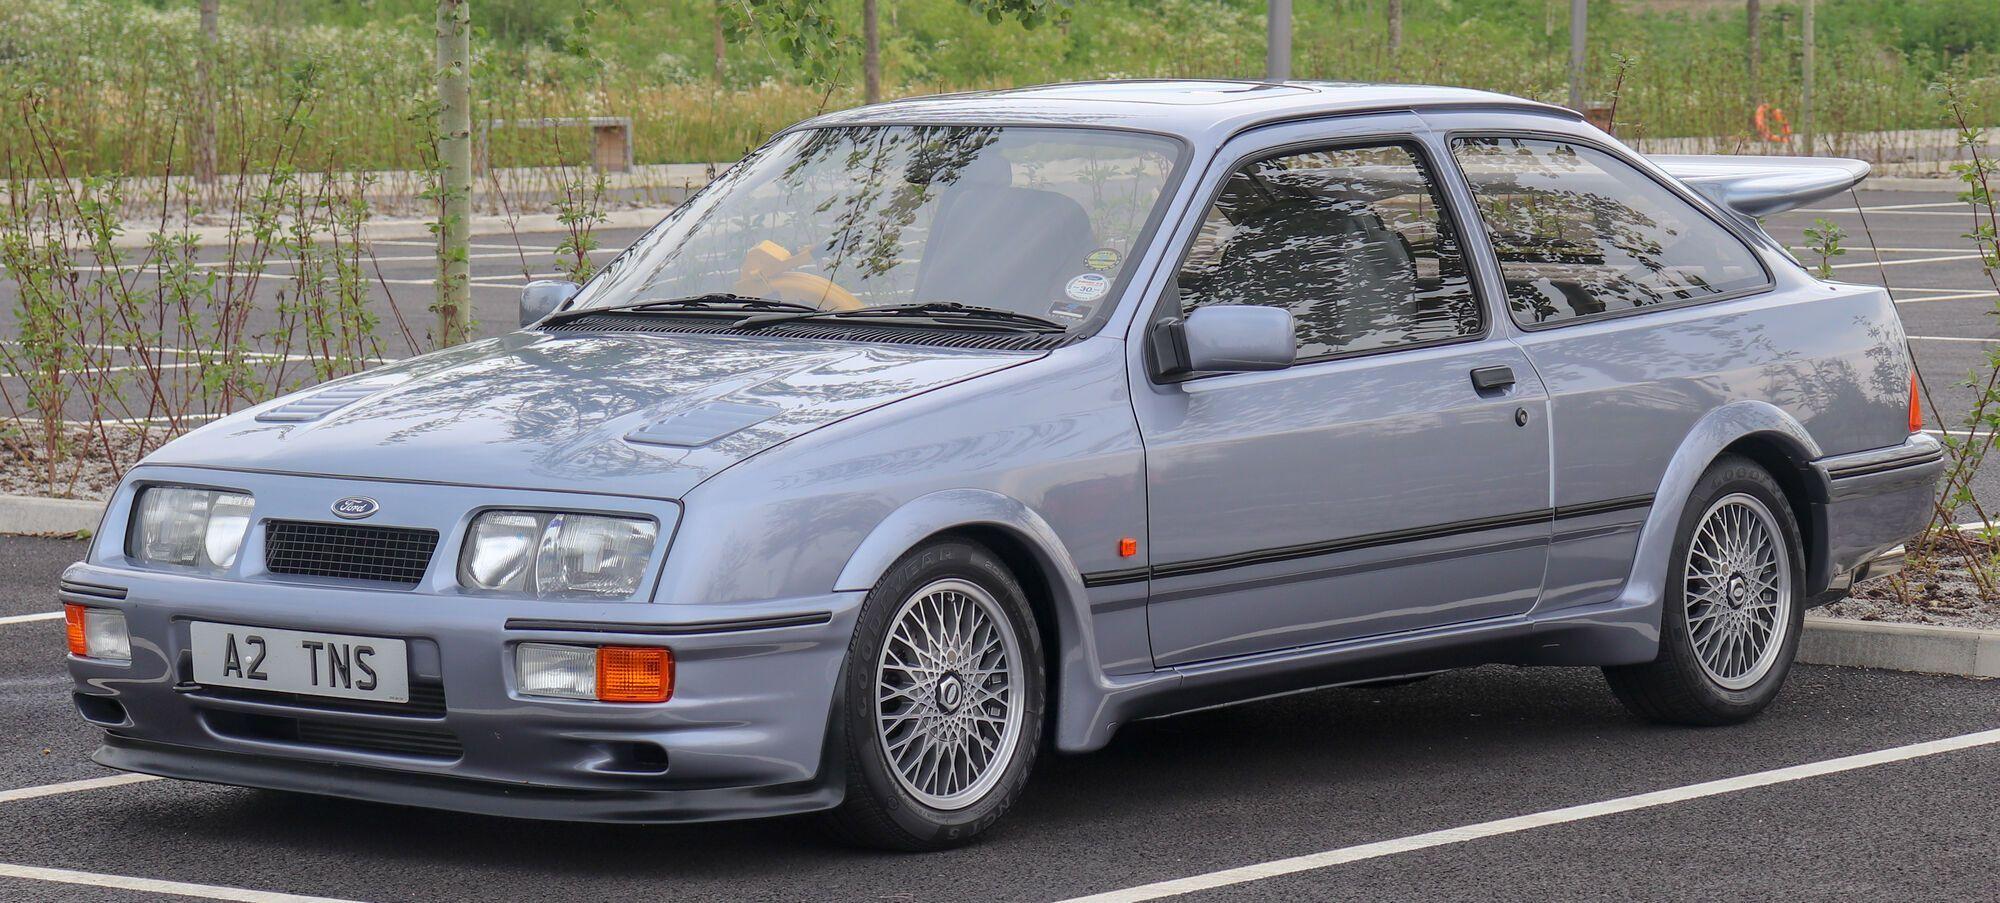 Ford Sierra Cosworth победил во многих гонках